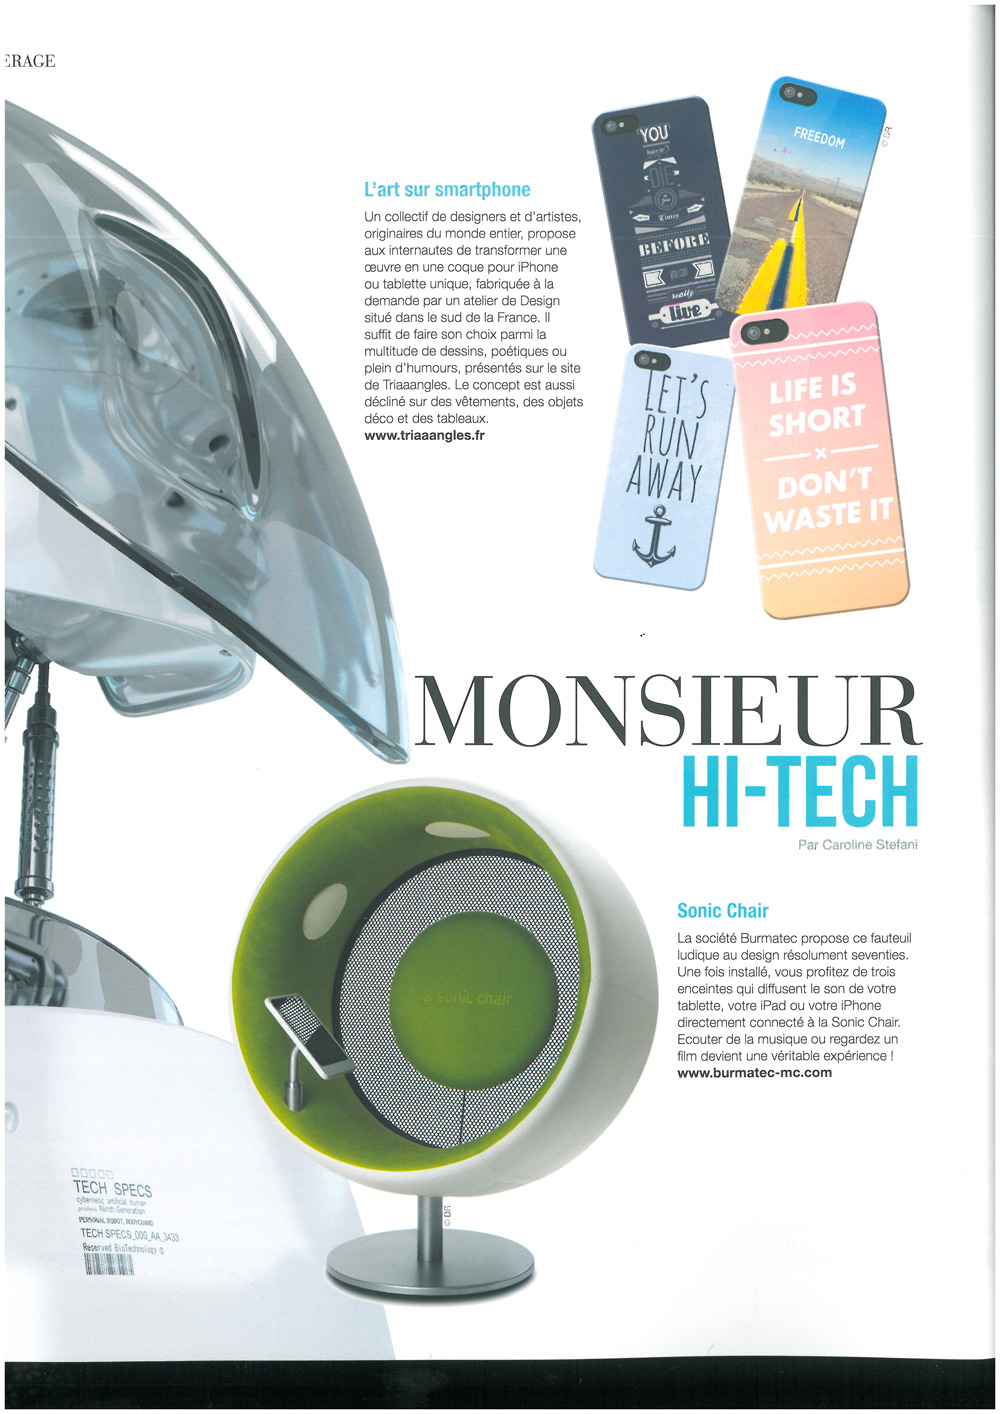 MONACO-MONSIEUR---ARTICLE-SONIC-CHAIR_Page_2